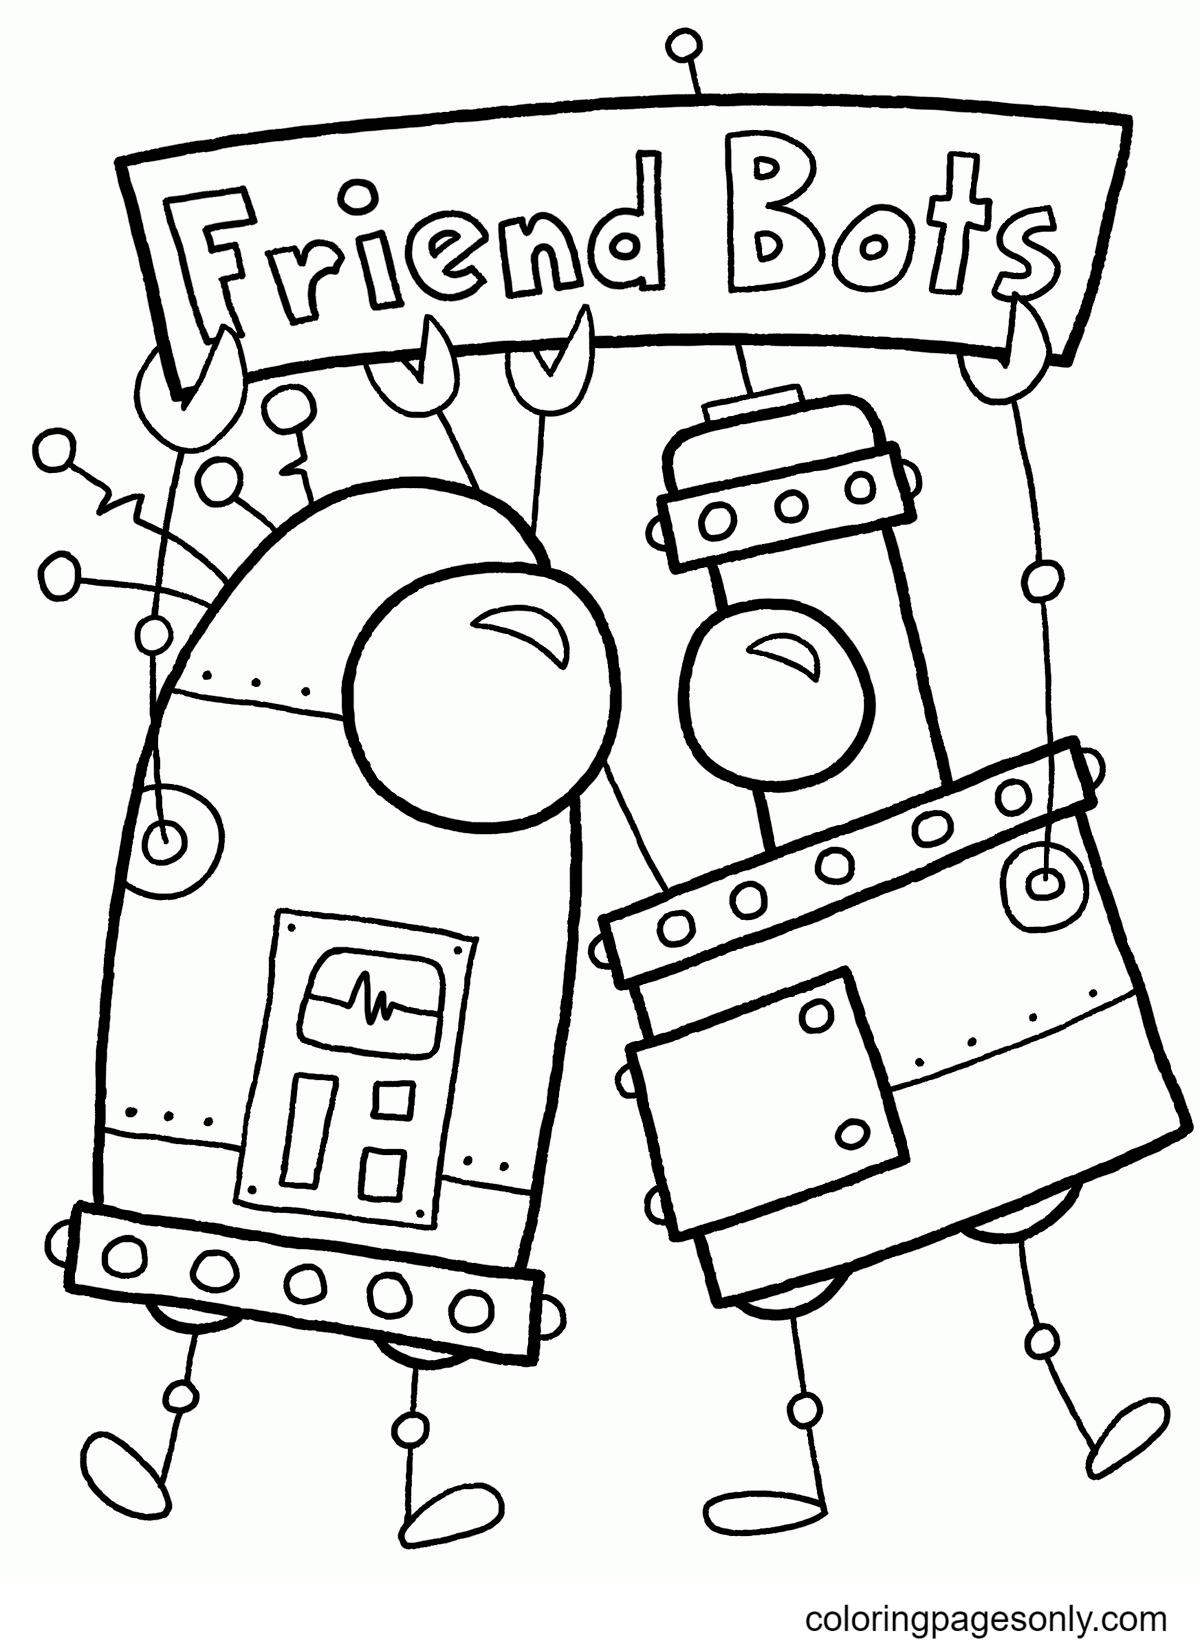 Friend Bots Coloring Page